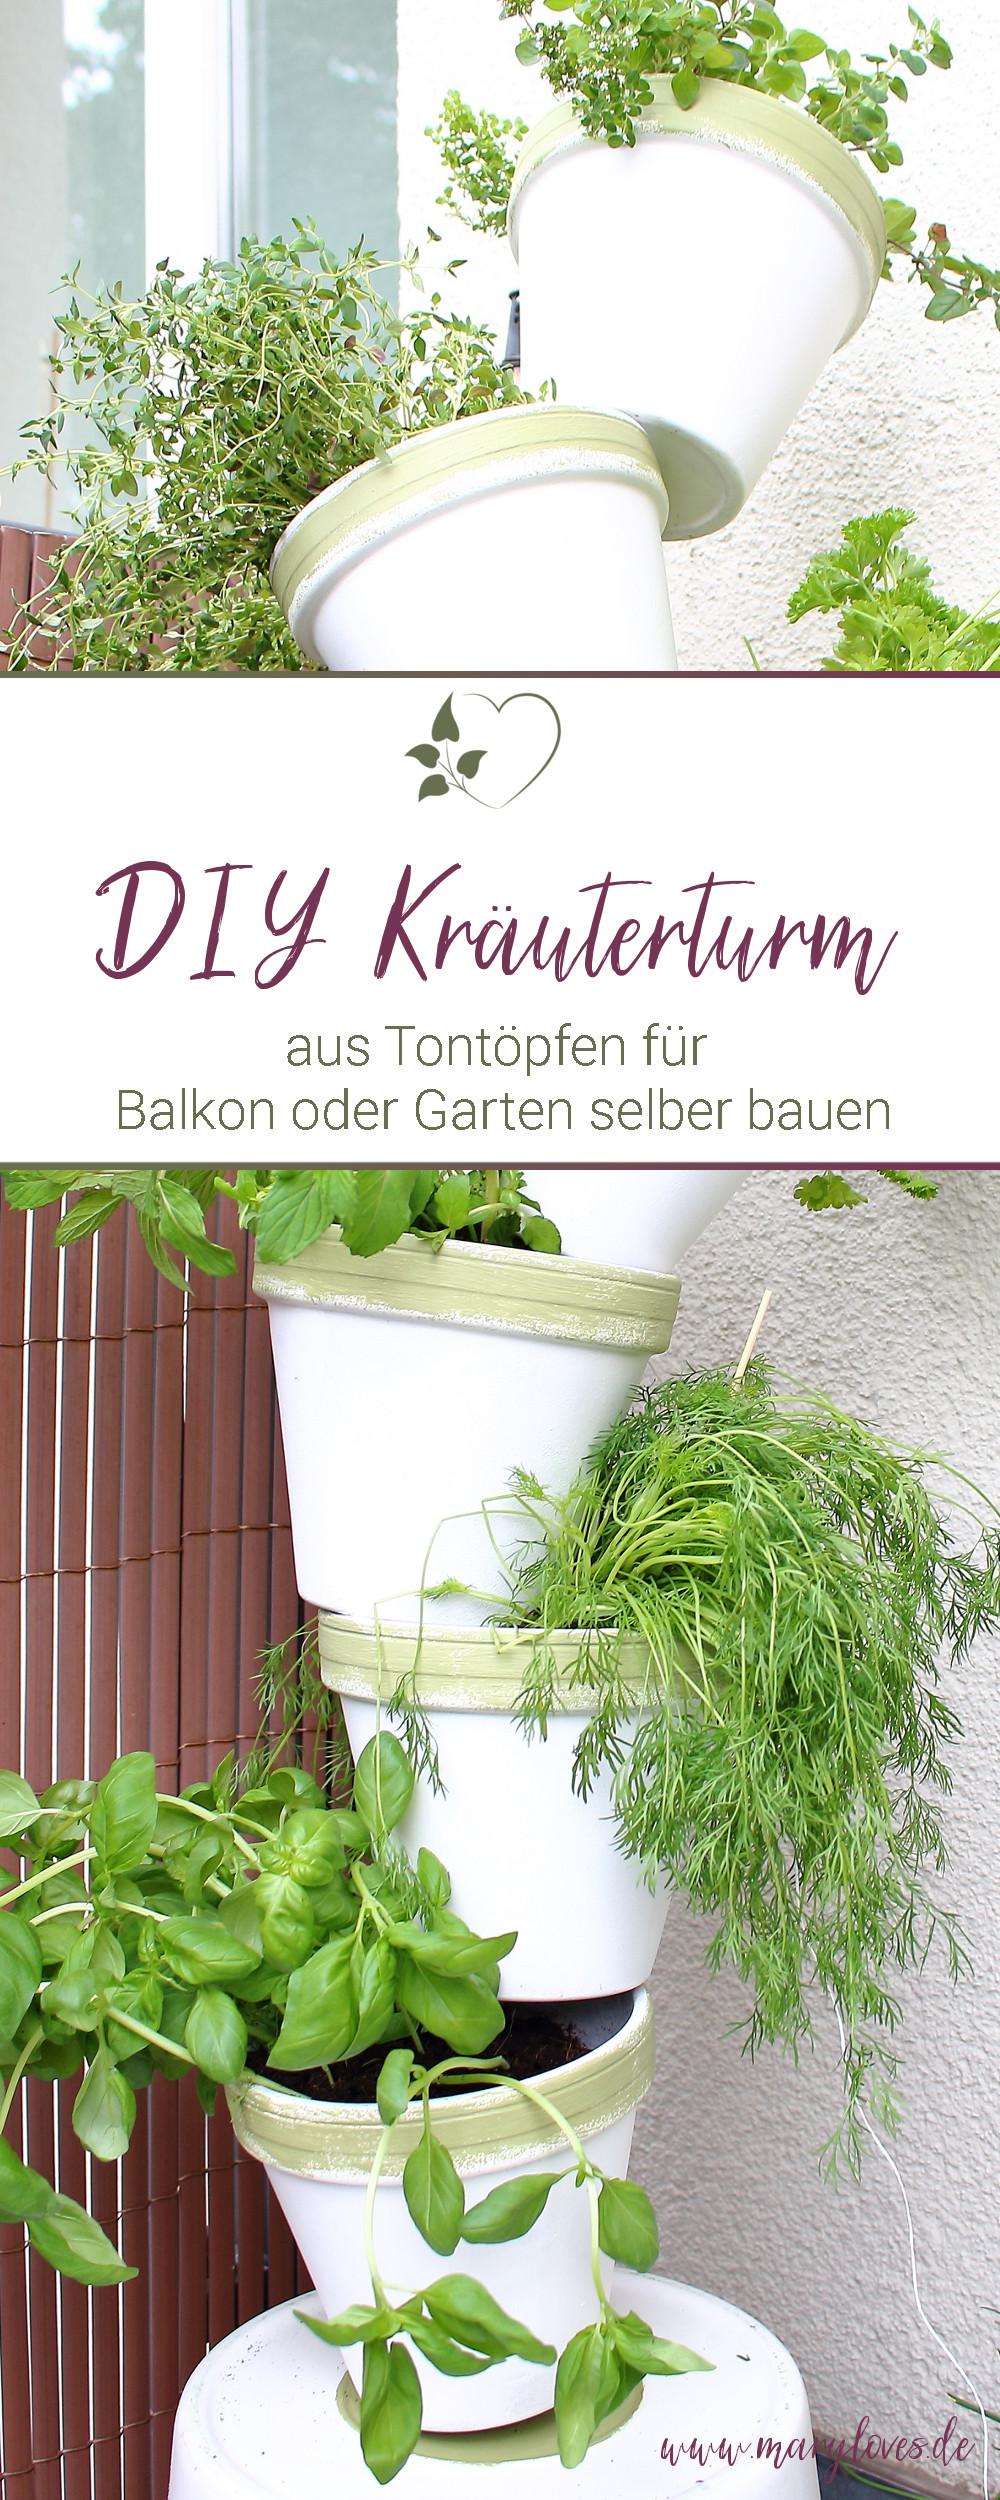 [Anzeige] DIY-Kräuterturm aus Tontöpfen für Balkon oder Terasse selber bauen - #Kräuterturm #Tontöpfe #Kräutereinpflanzen #Kräuterbalkon #balkonpflanzen #DIY #DIYKräuterturm